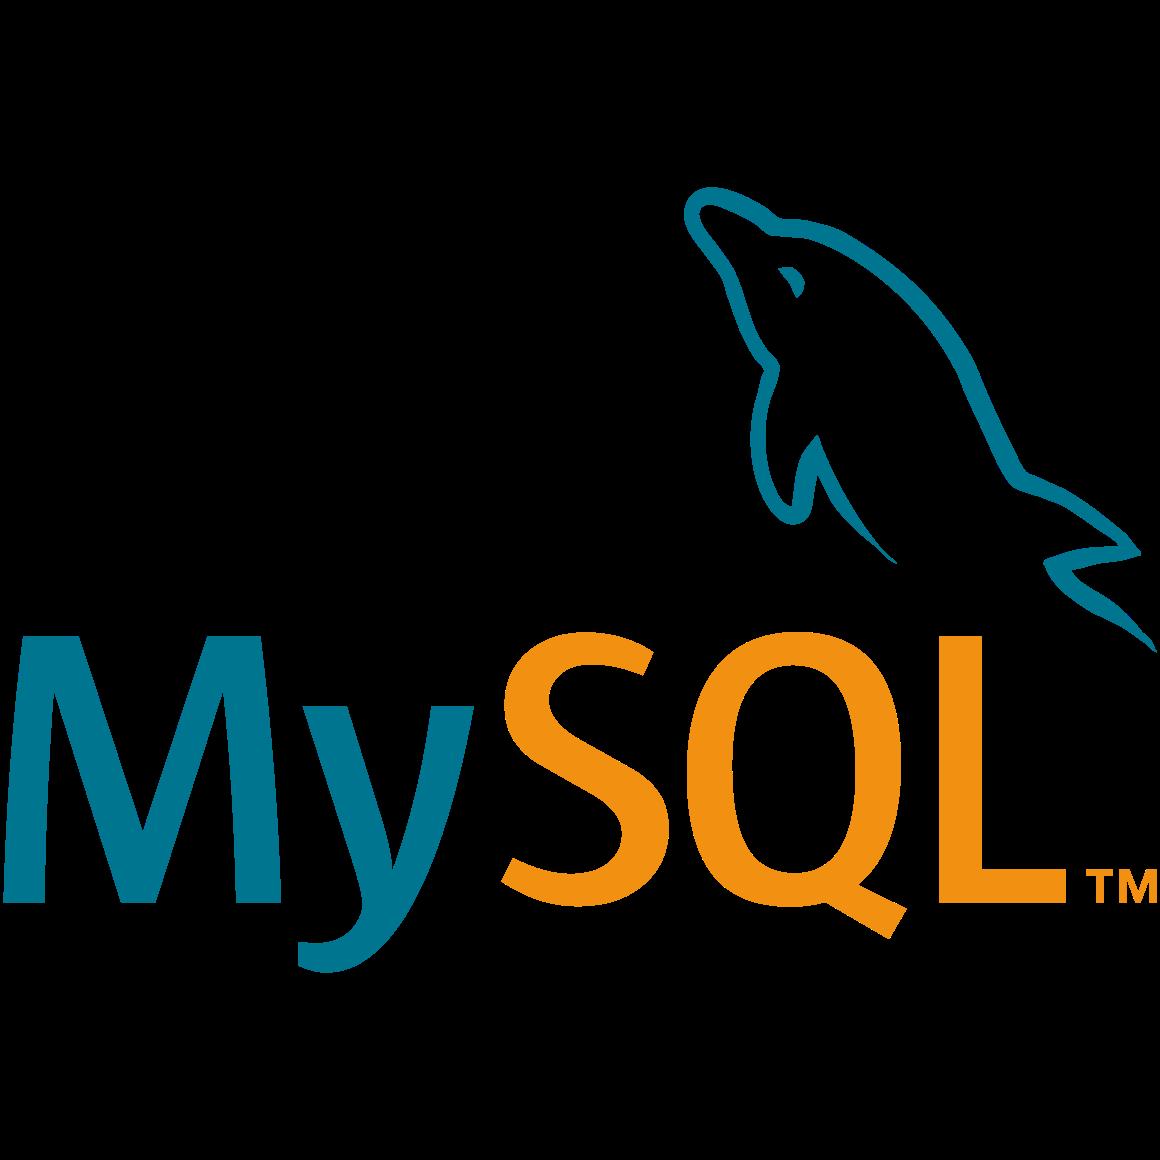 nodetypes/http%3A%2F%2Fdch.uni-koeln.de%2Ftosca%2Fnodetypes/MySQL-DBMS_5.7.26-w1-wip1/appearance/bigIcon.png